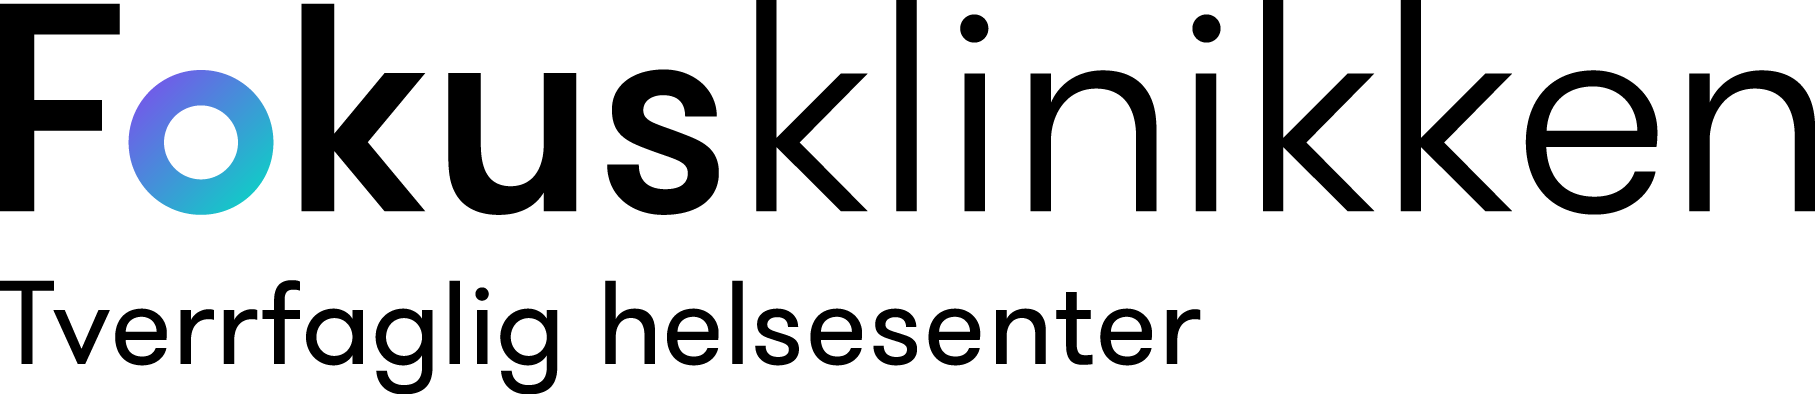 Fokusklinikken-tagline.png